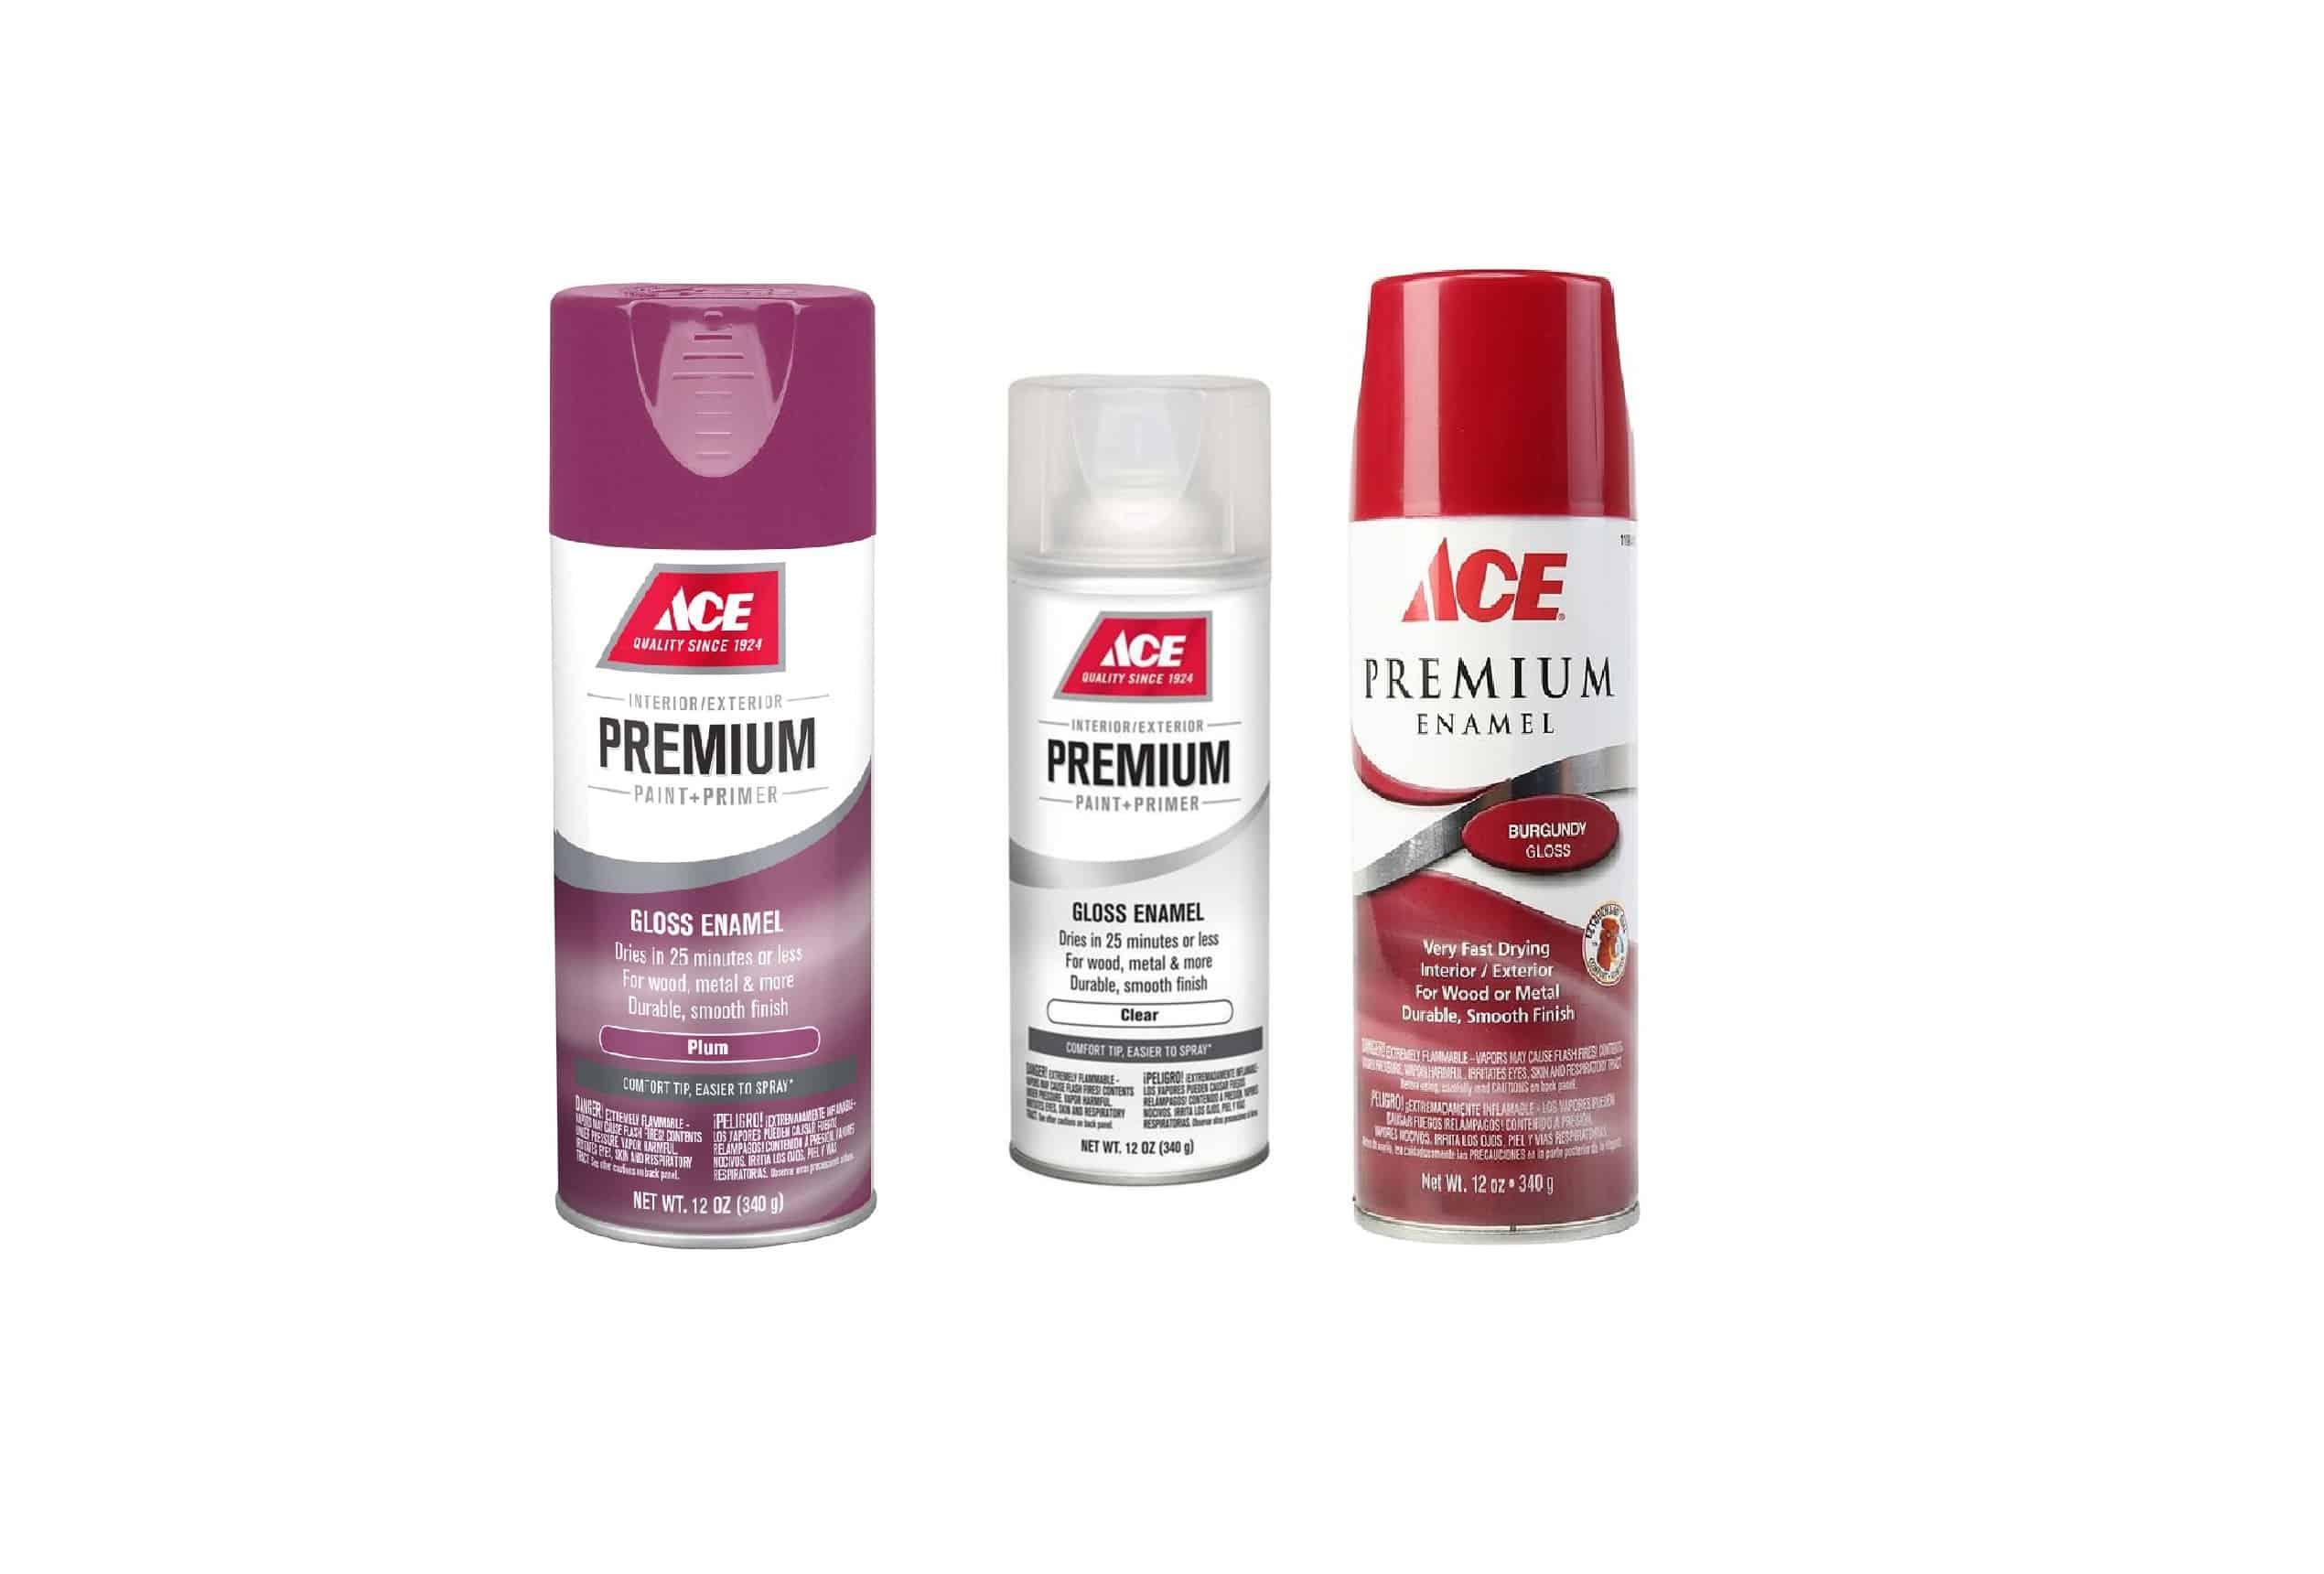 Premium-Enamel-Spray-Paint-ACE